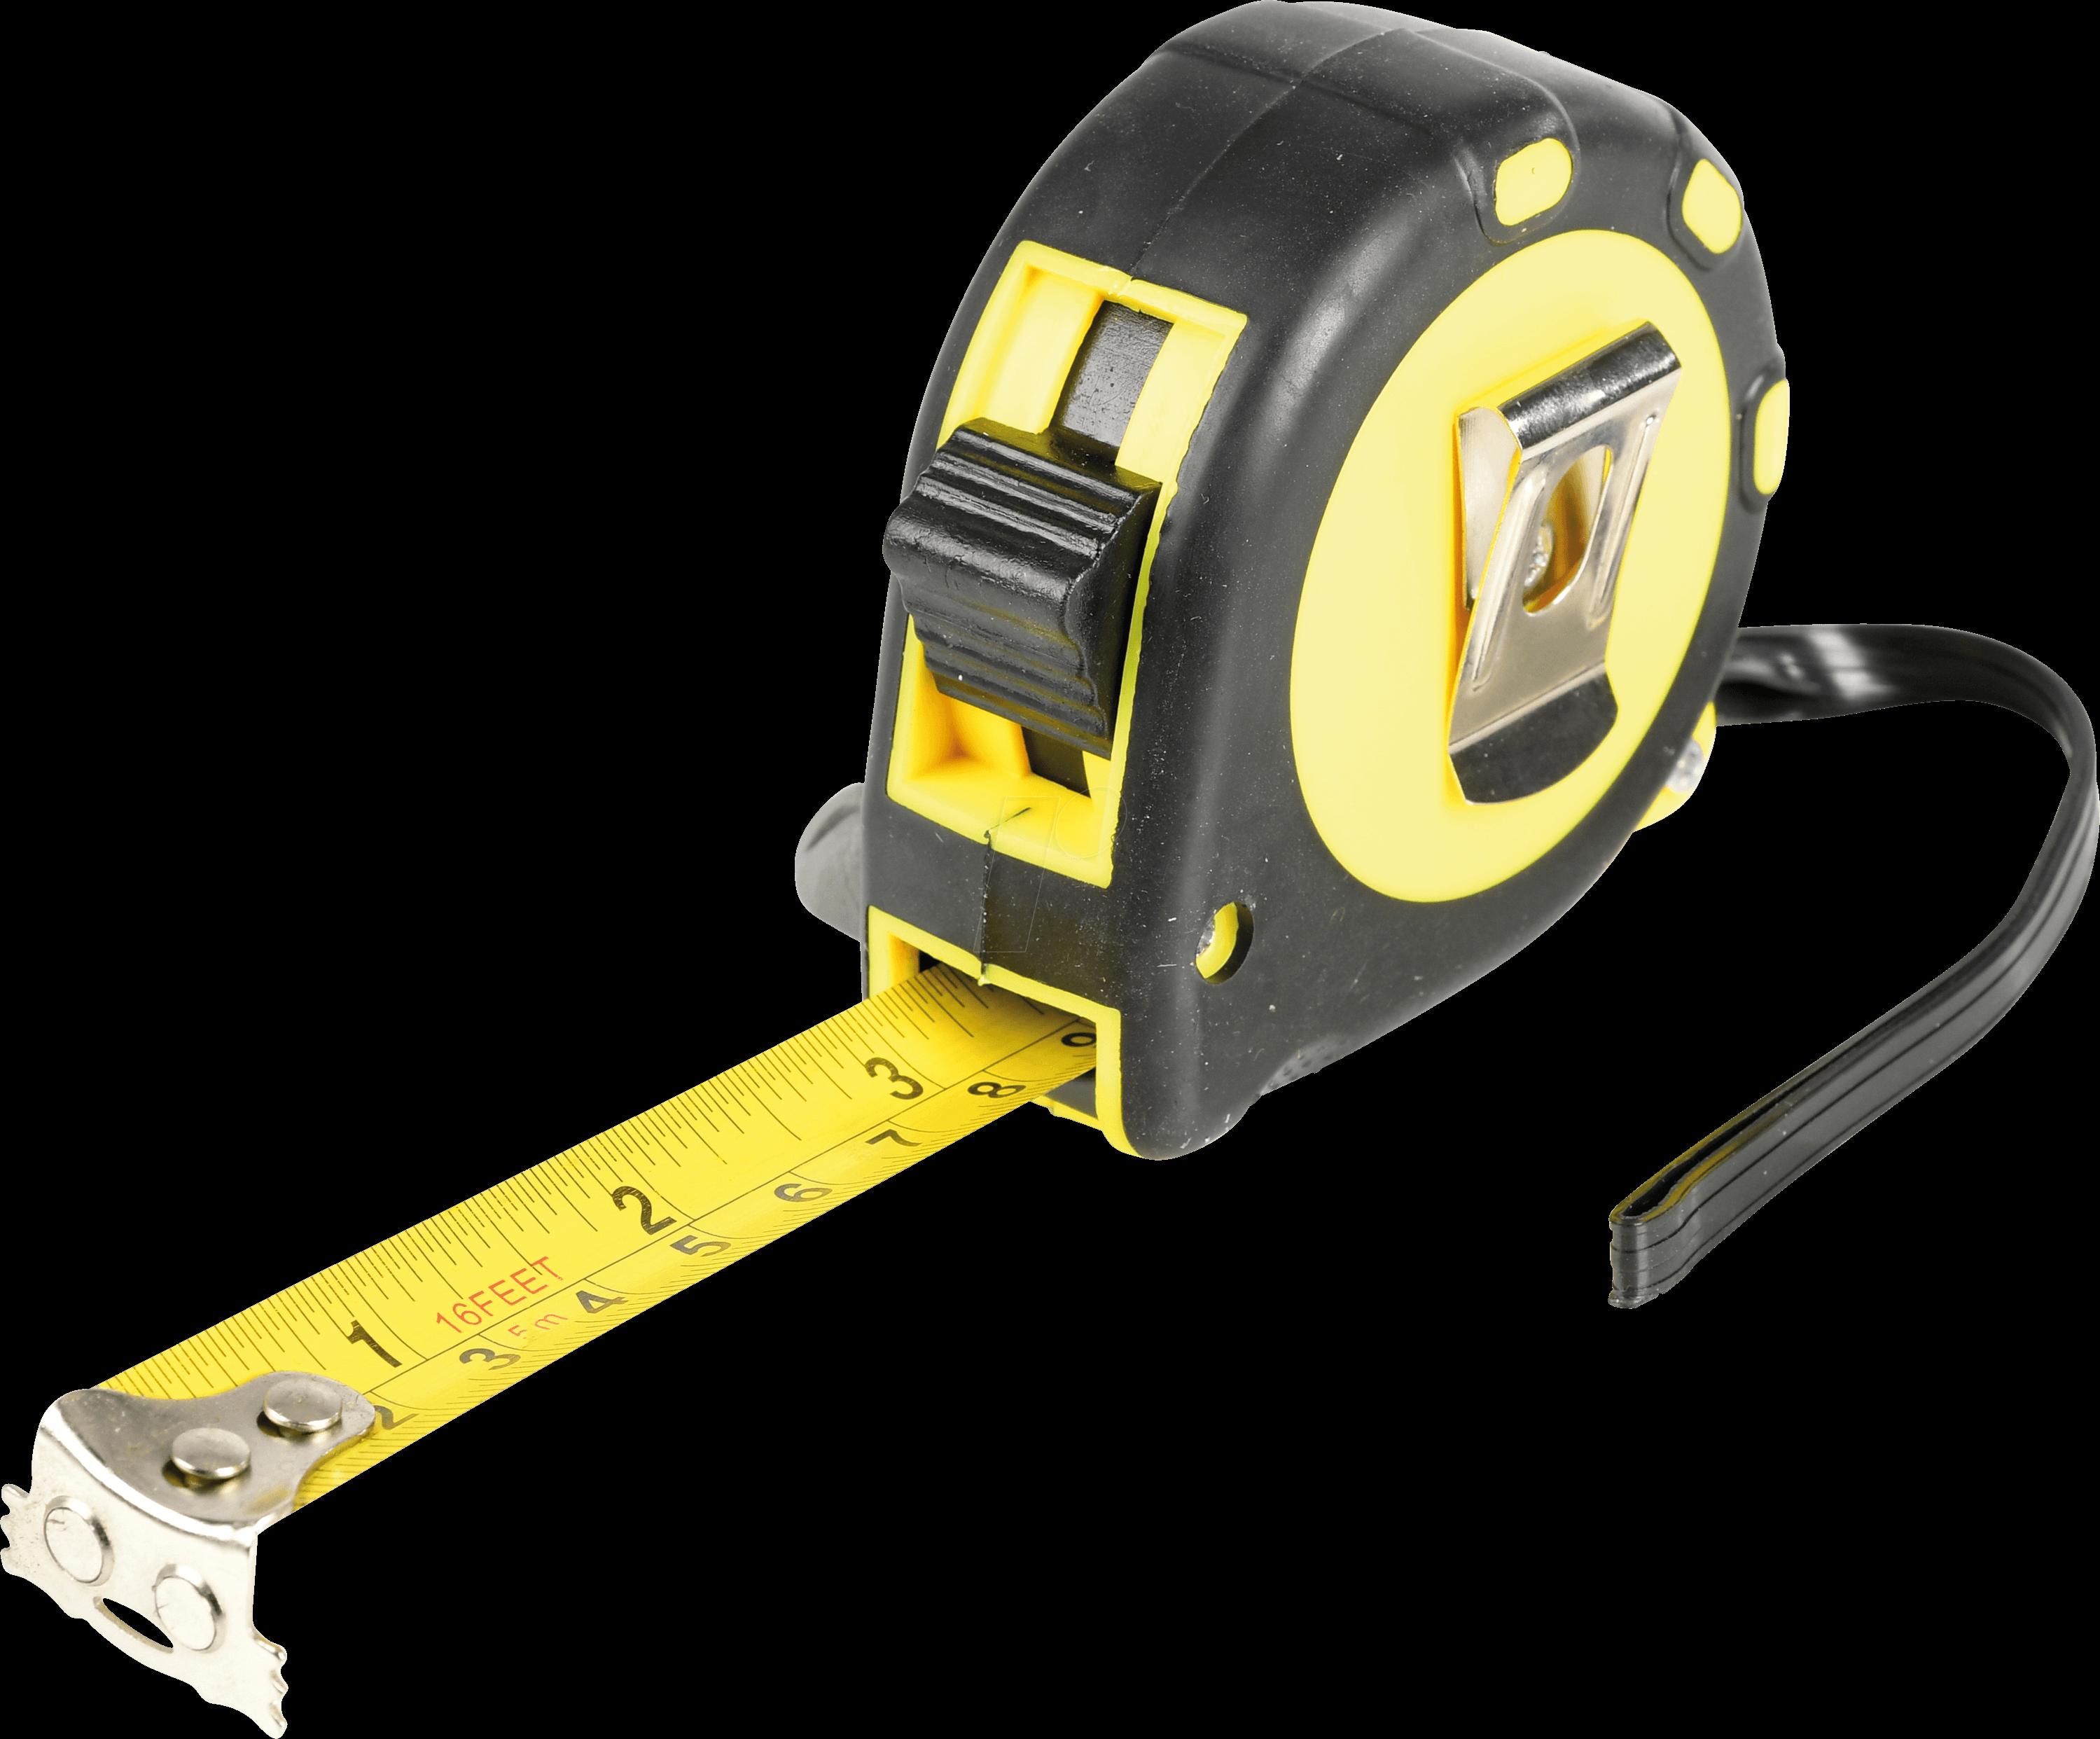 Télécharger photo measuring tape png